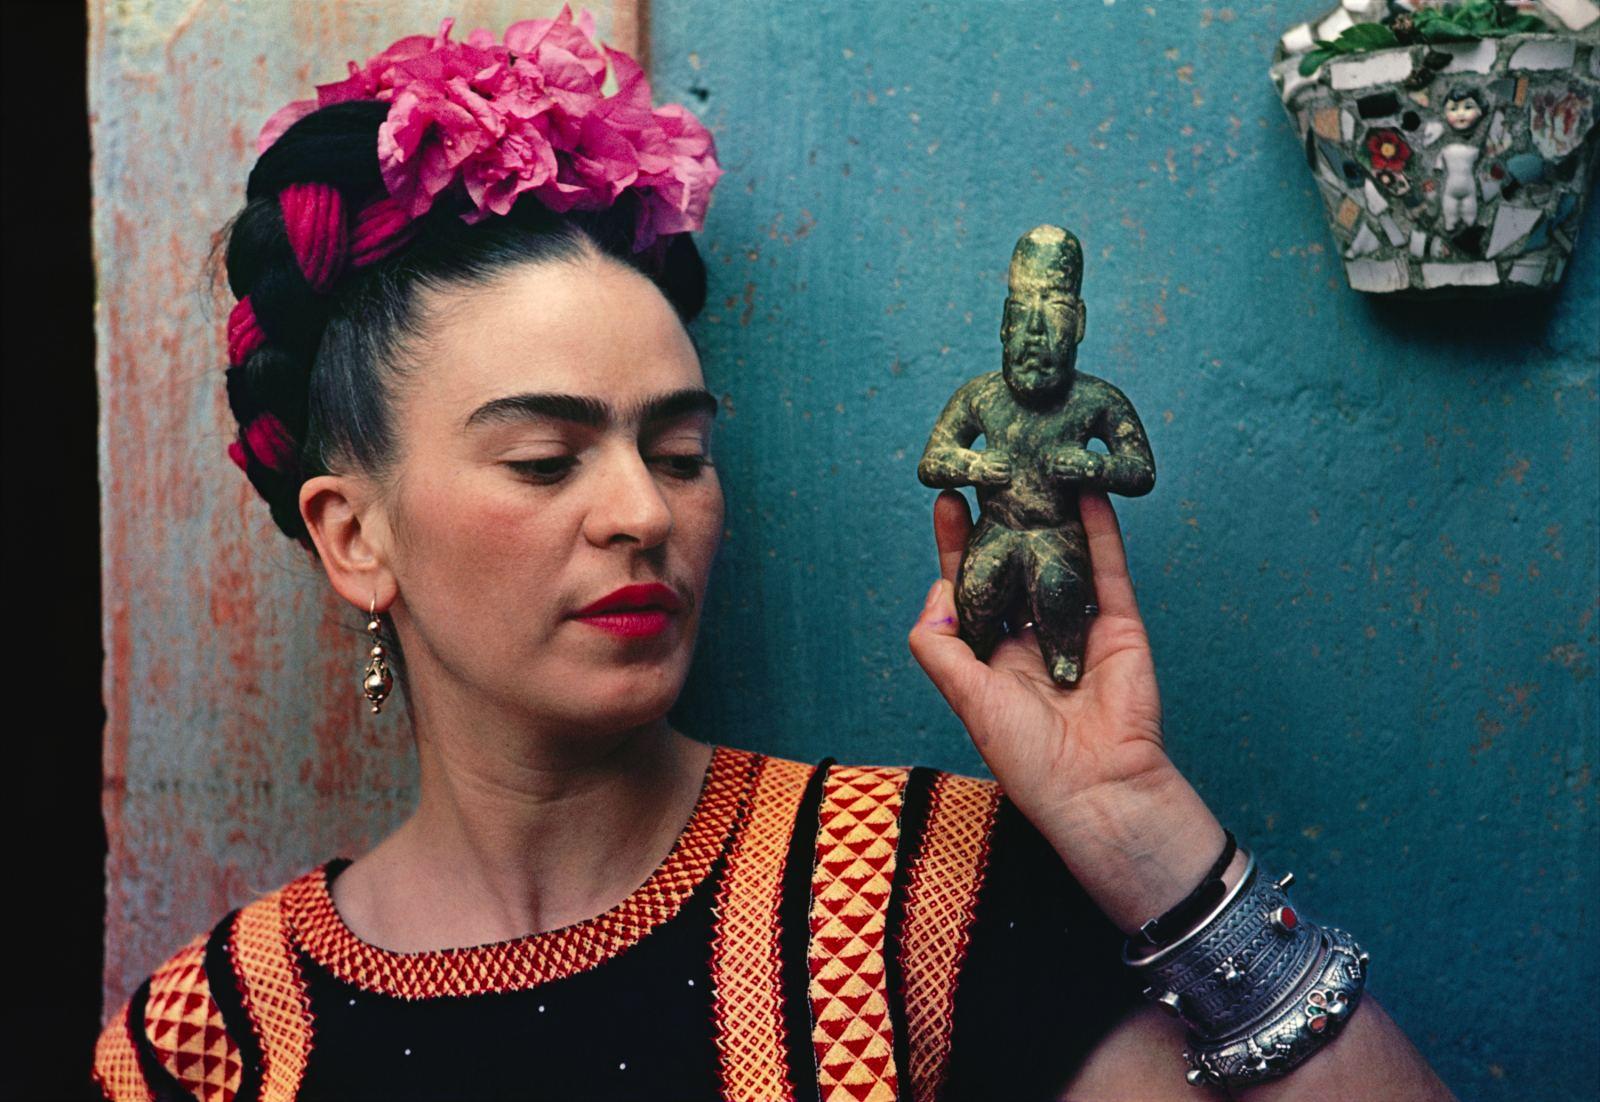 Frida Kahlo with Olmec figurine, 1939. Photograph Nickolas Muray. © Nickolas Muray Photo Archives